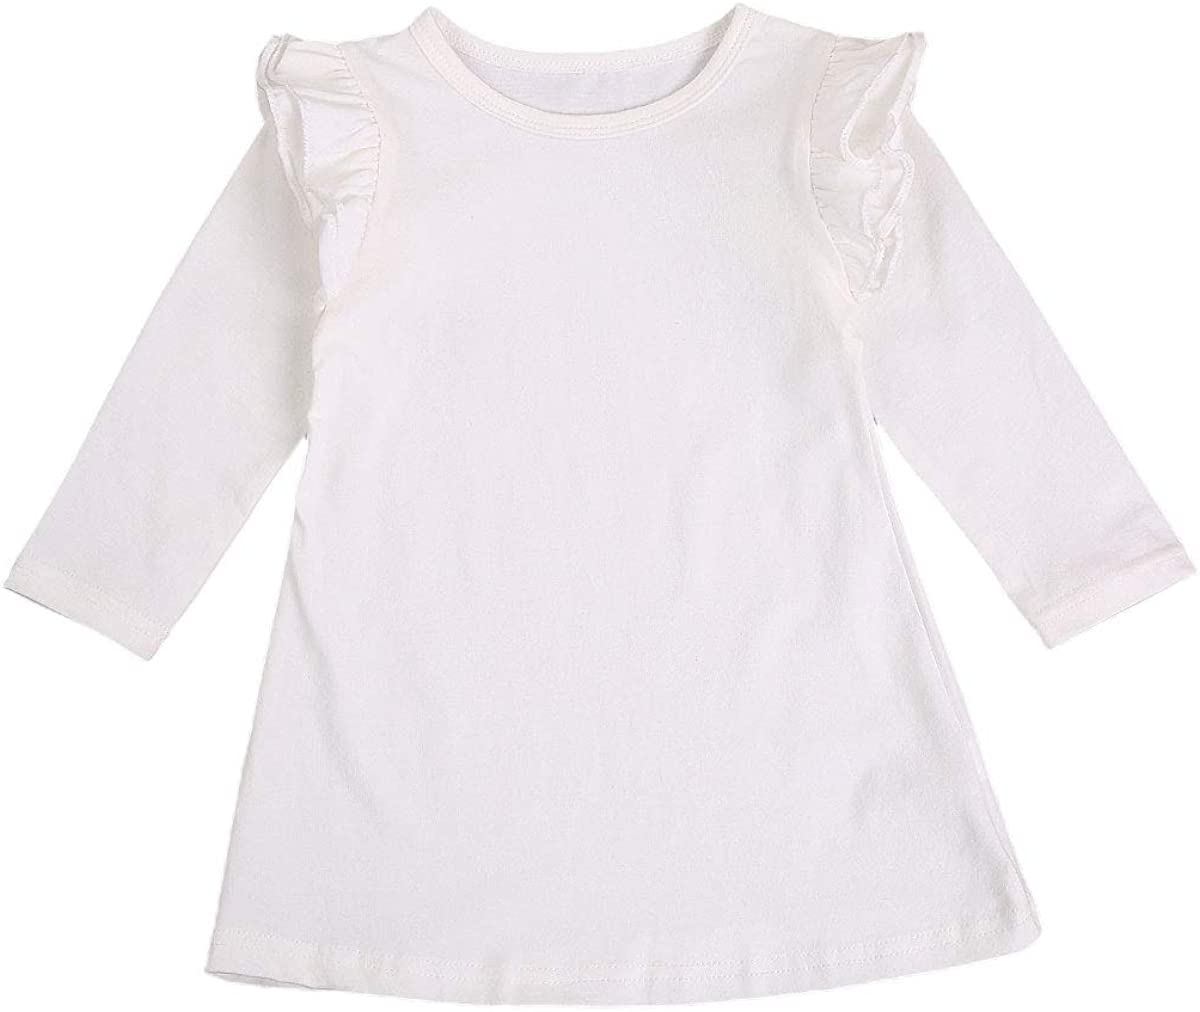 Seyurigaoka Girls ' Organic Cotton Long-Sleeve Dresses, Toddler Baby Girl Basic Plain Ruffle Shirt Tunic Dess 1 Piece Outfits